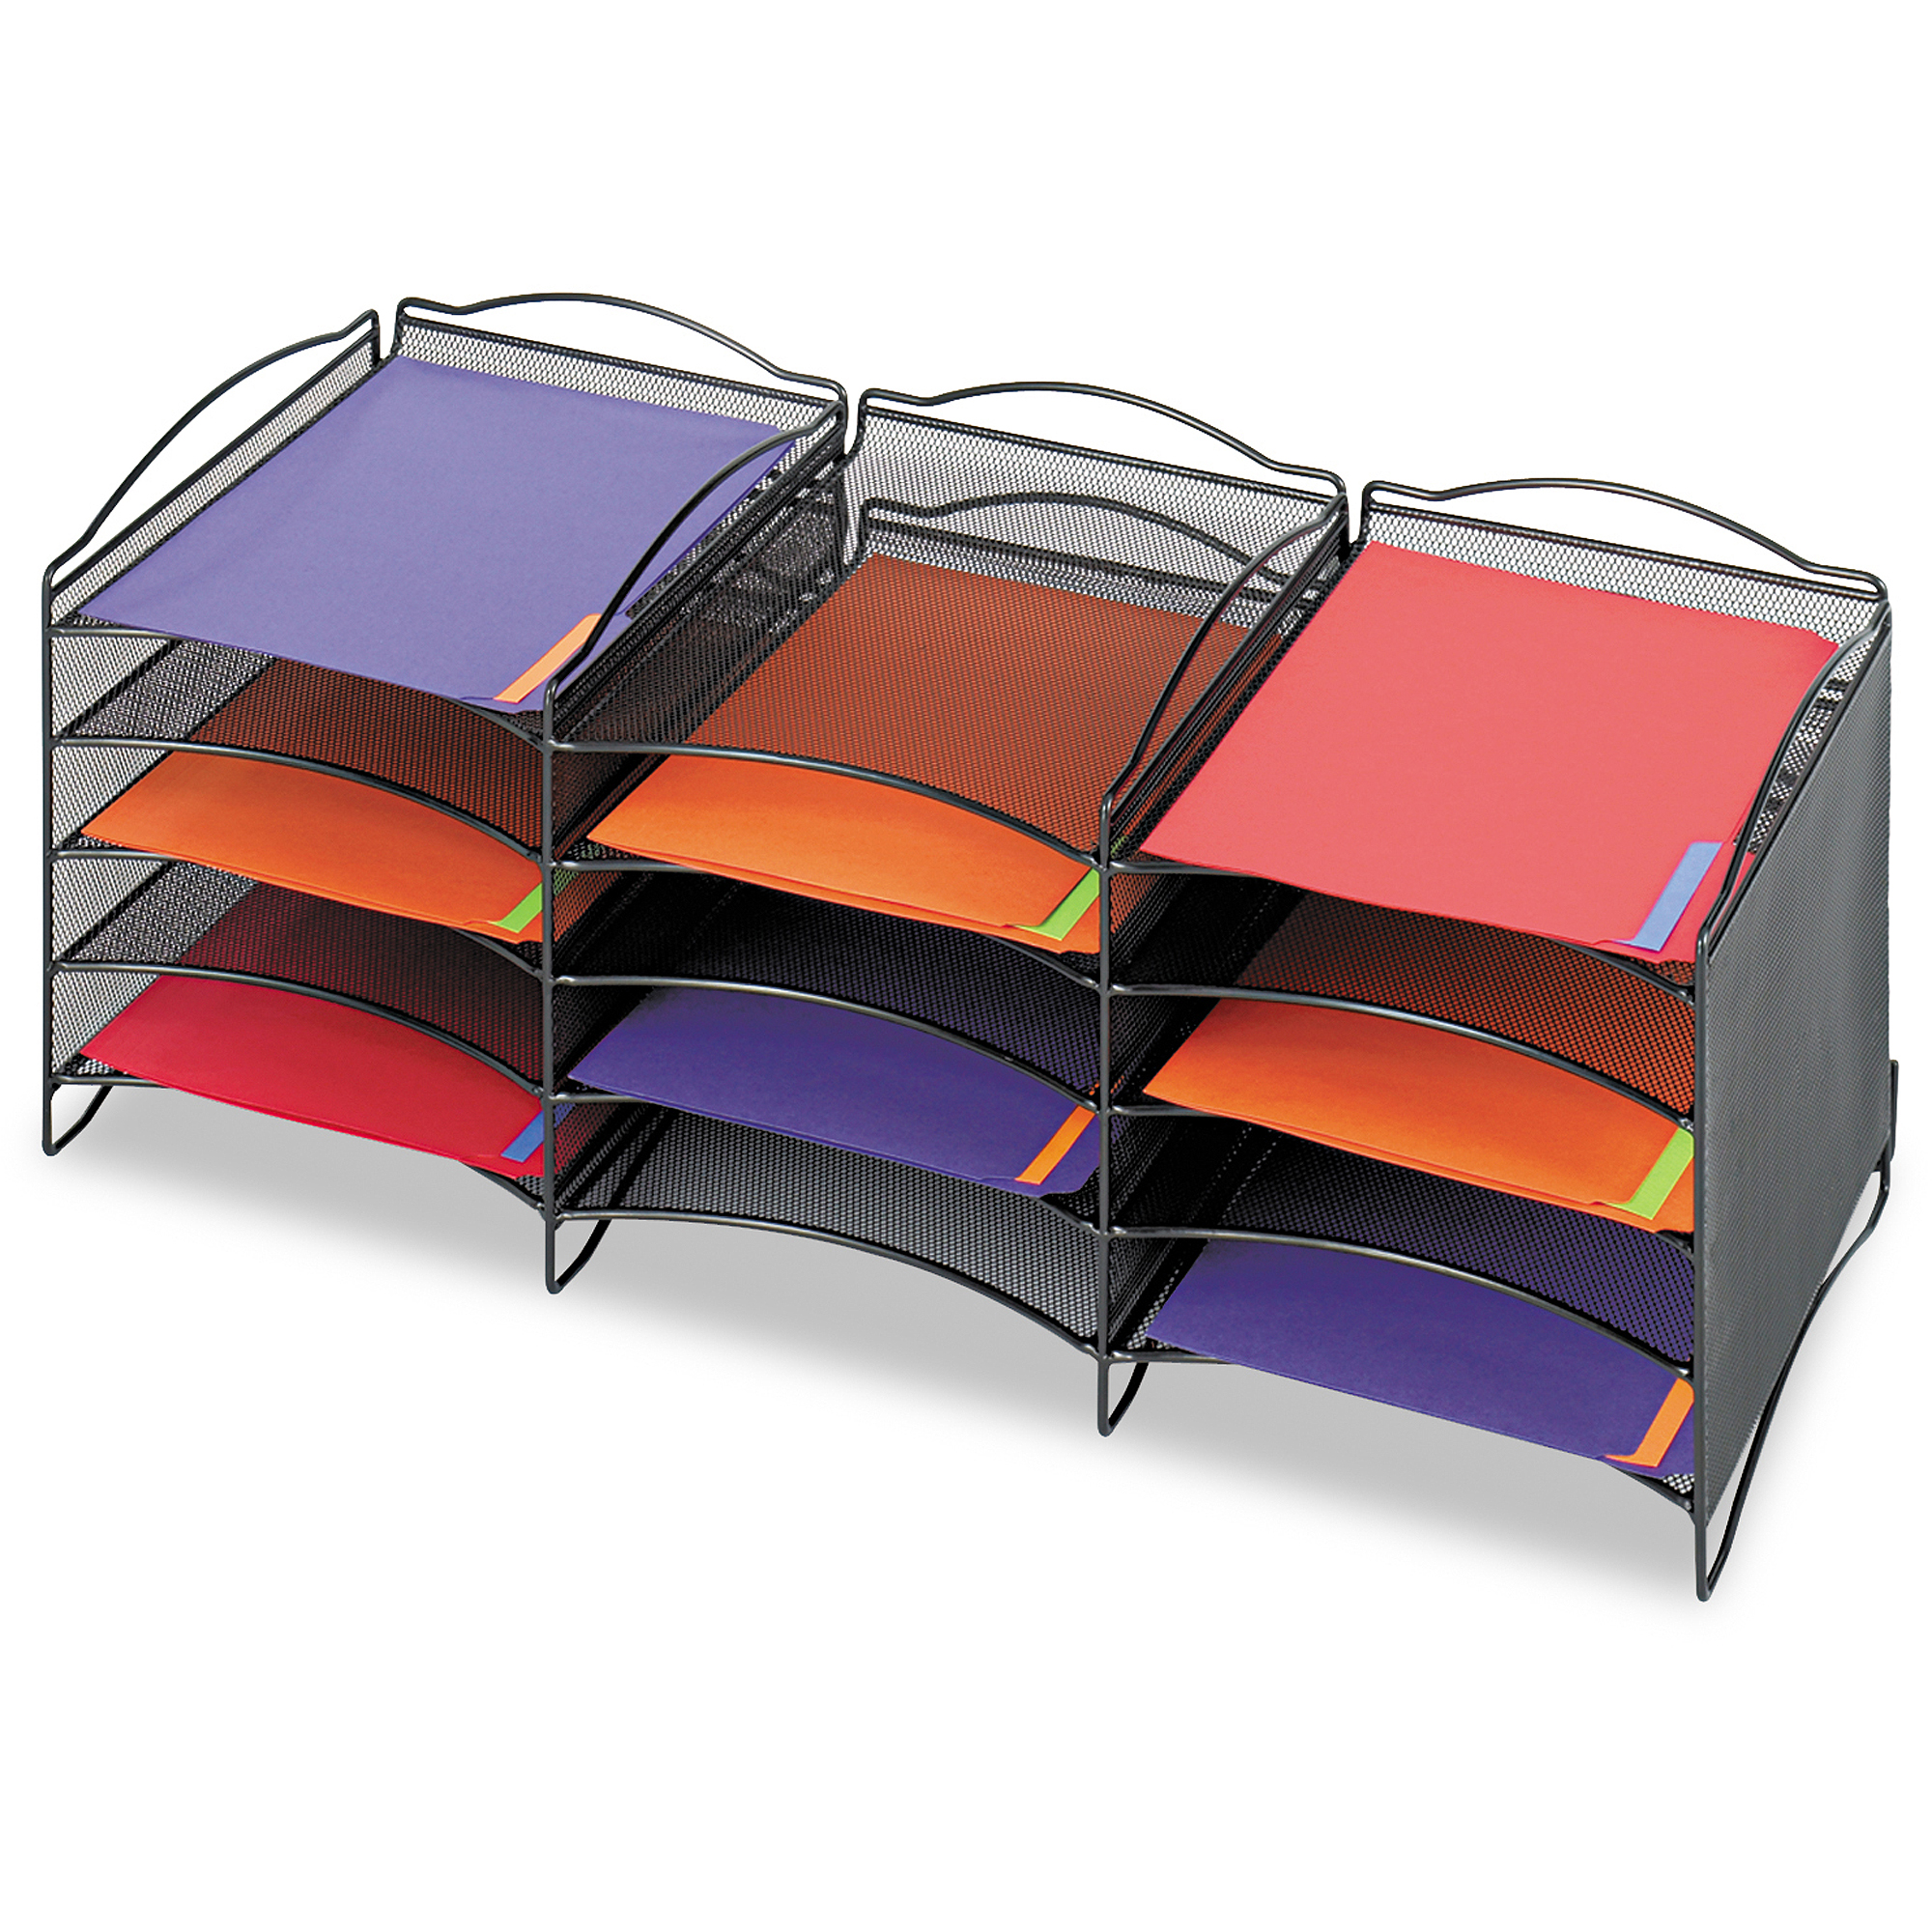 Safco Onyx Steel Mesh Lliterature Sorter, 12 Compartments, Black